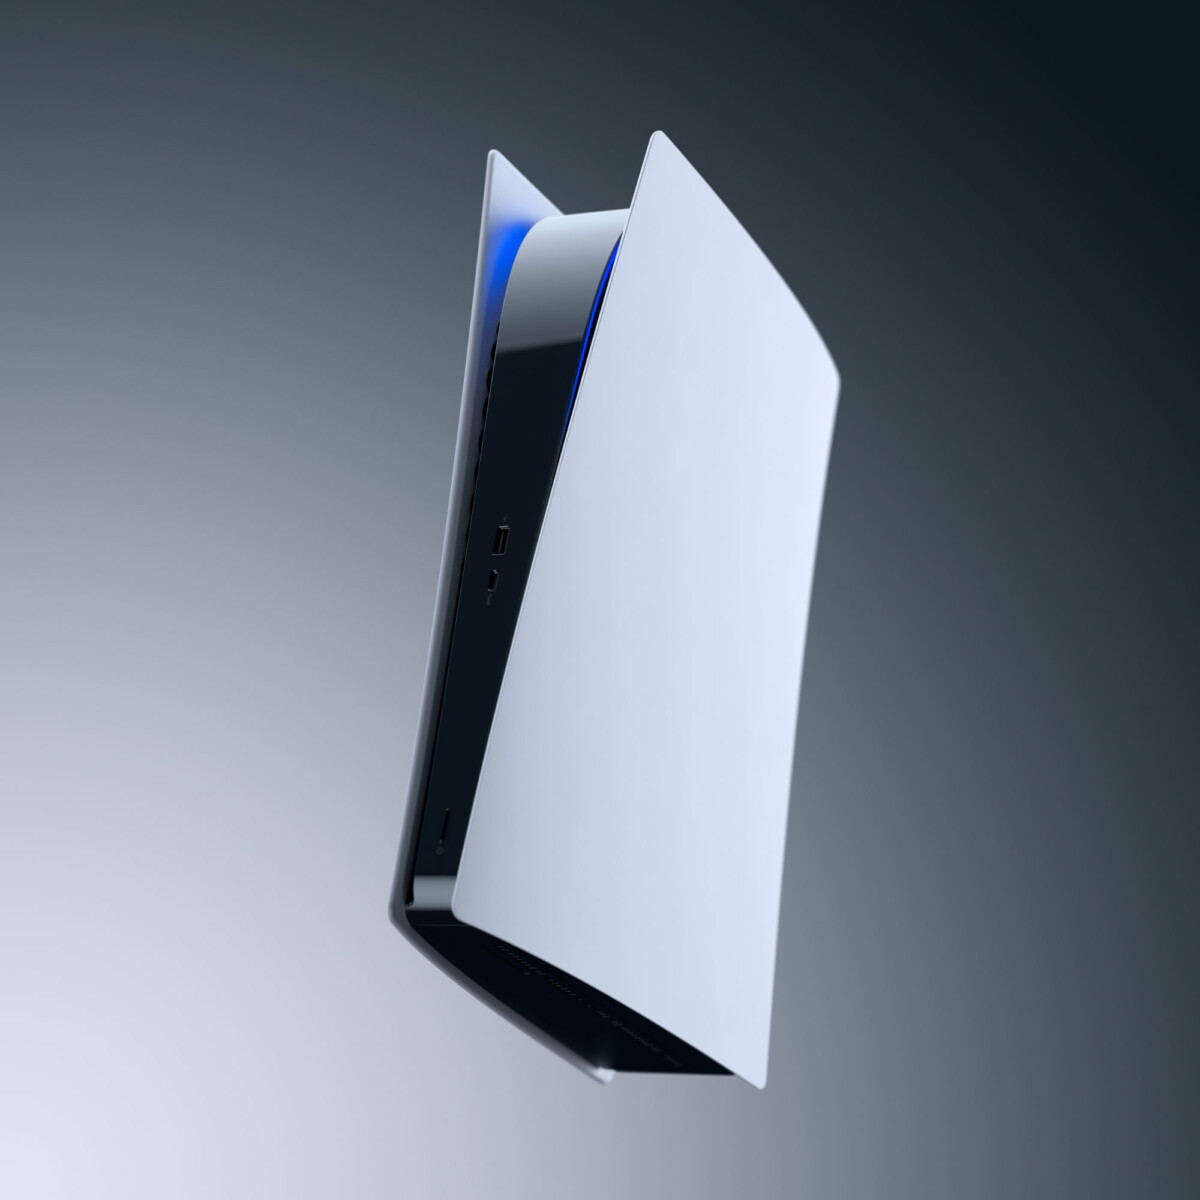 La PlayStation 5 Digital Edition